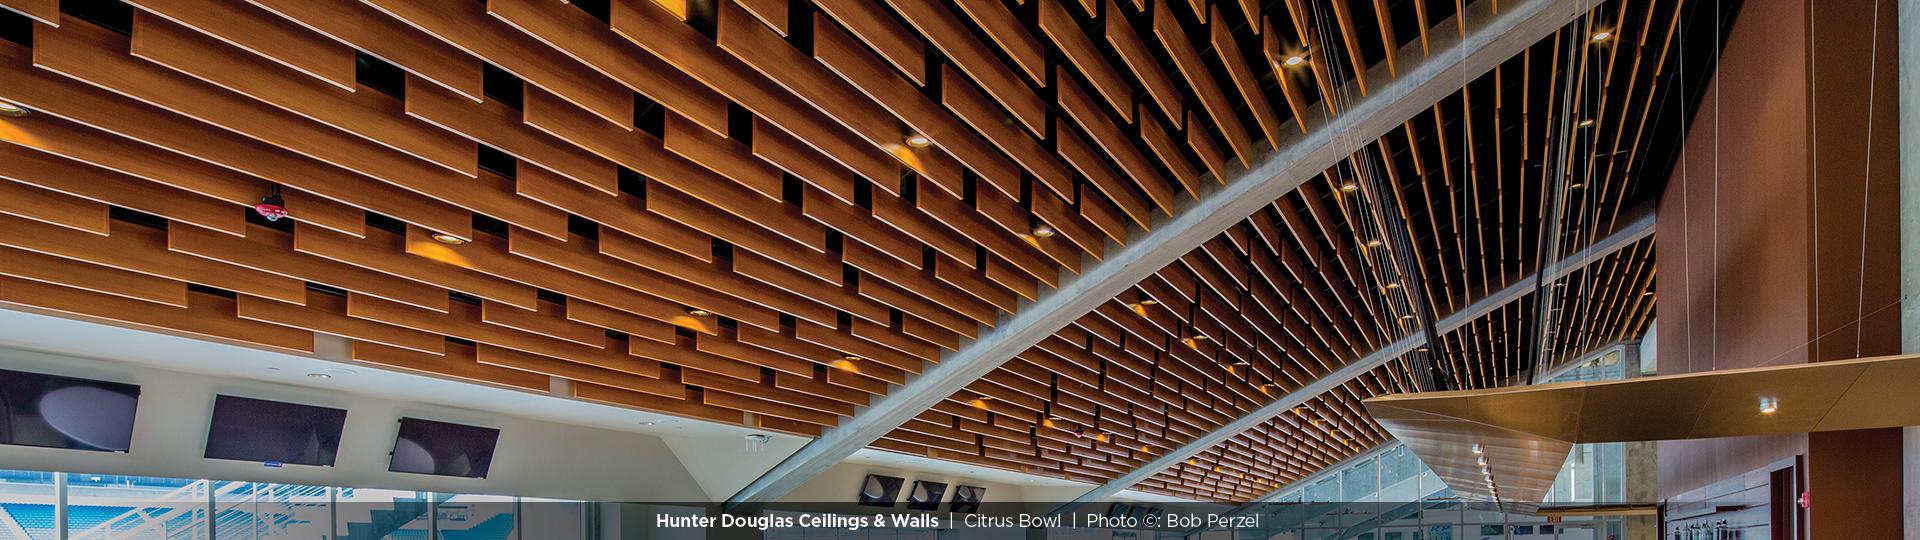 Tavola Prime   Hunter Douglas Ceilings & Walls   CertainTeed